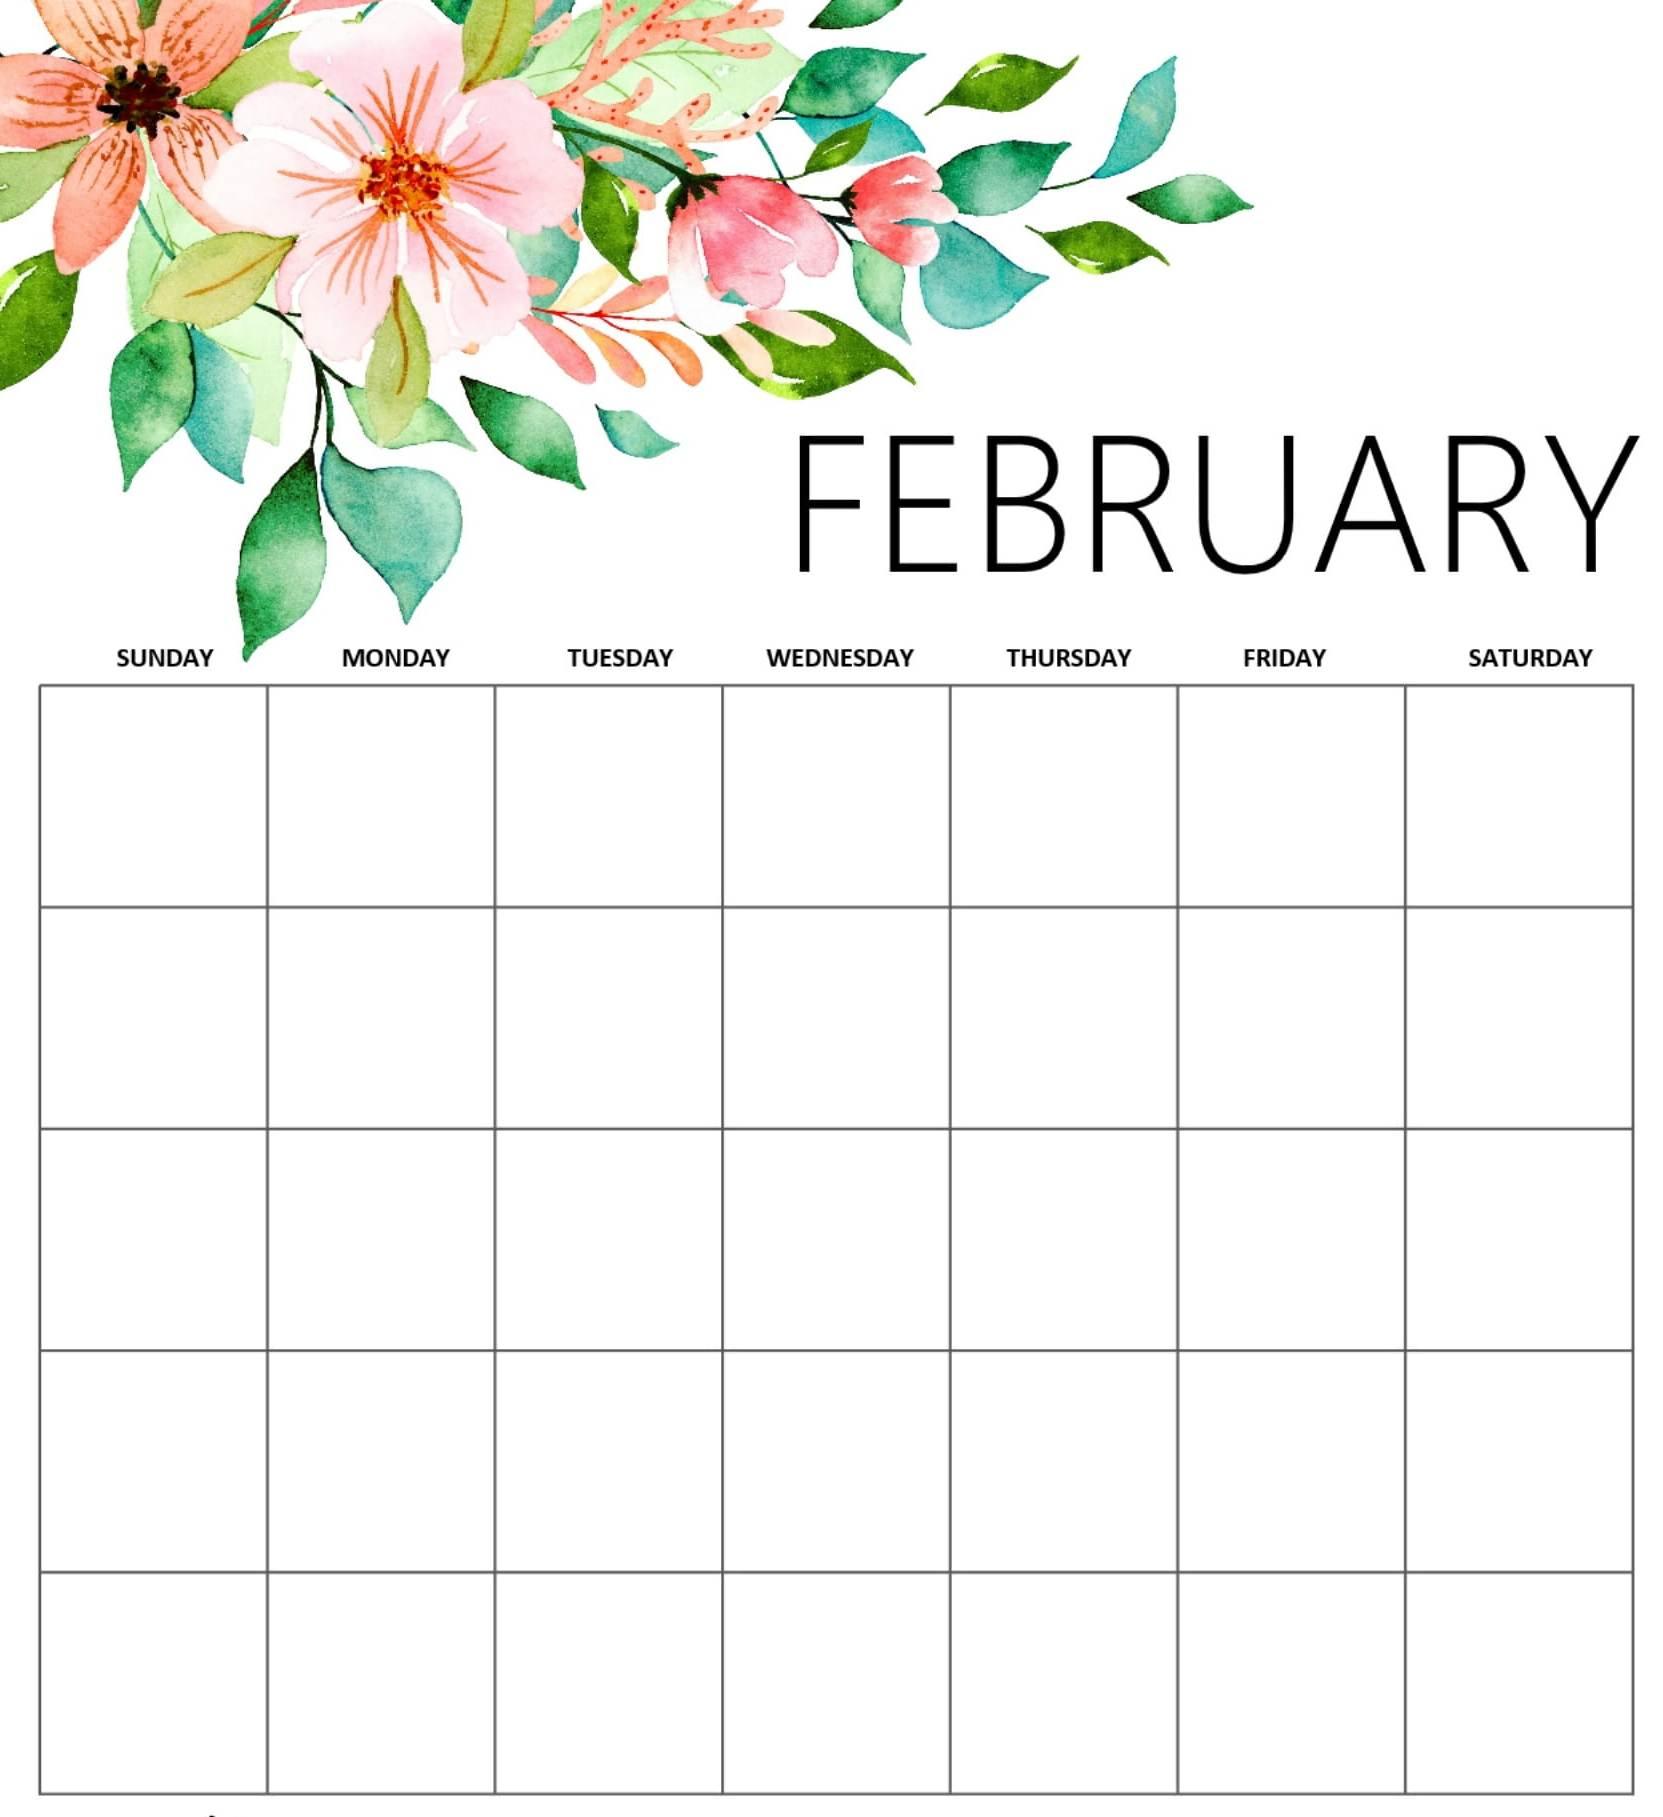 Print February 2019 Blank Cute Calendar